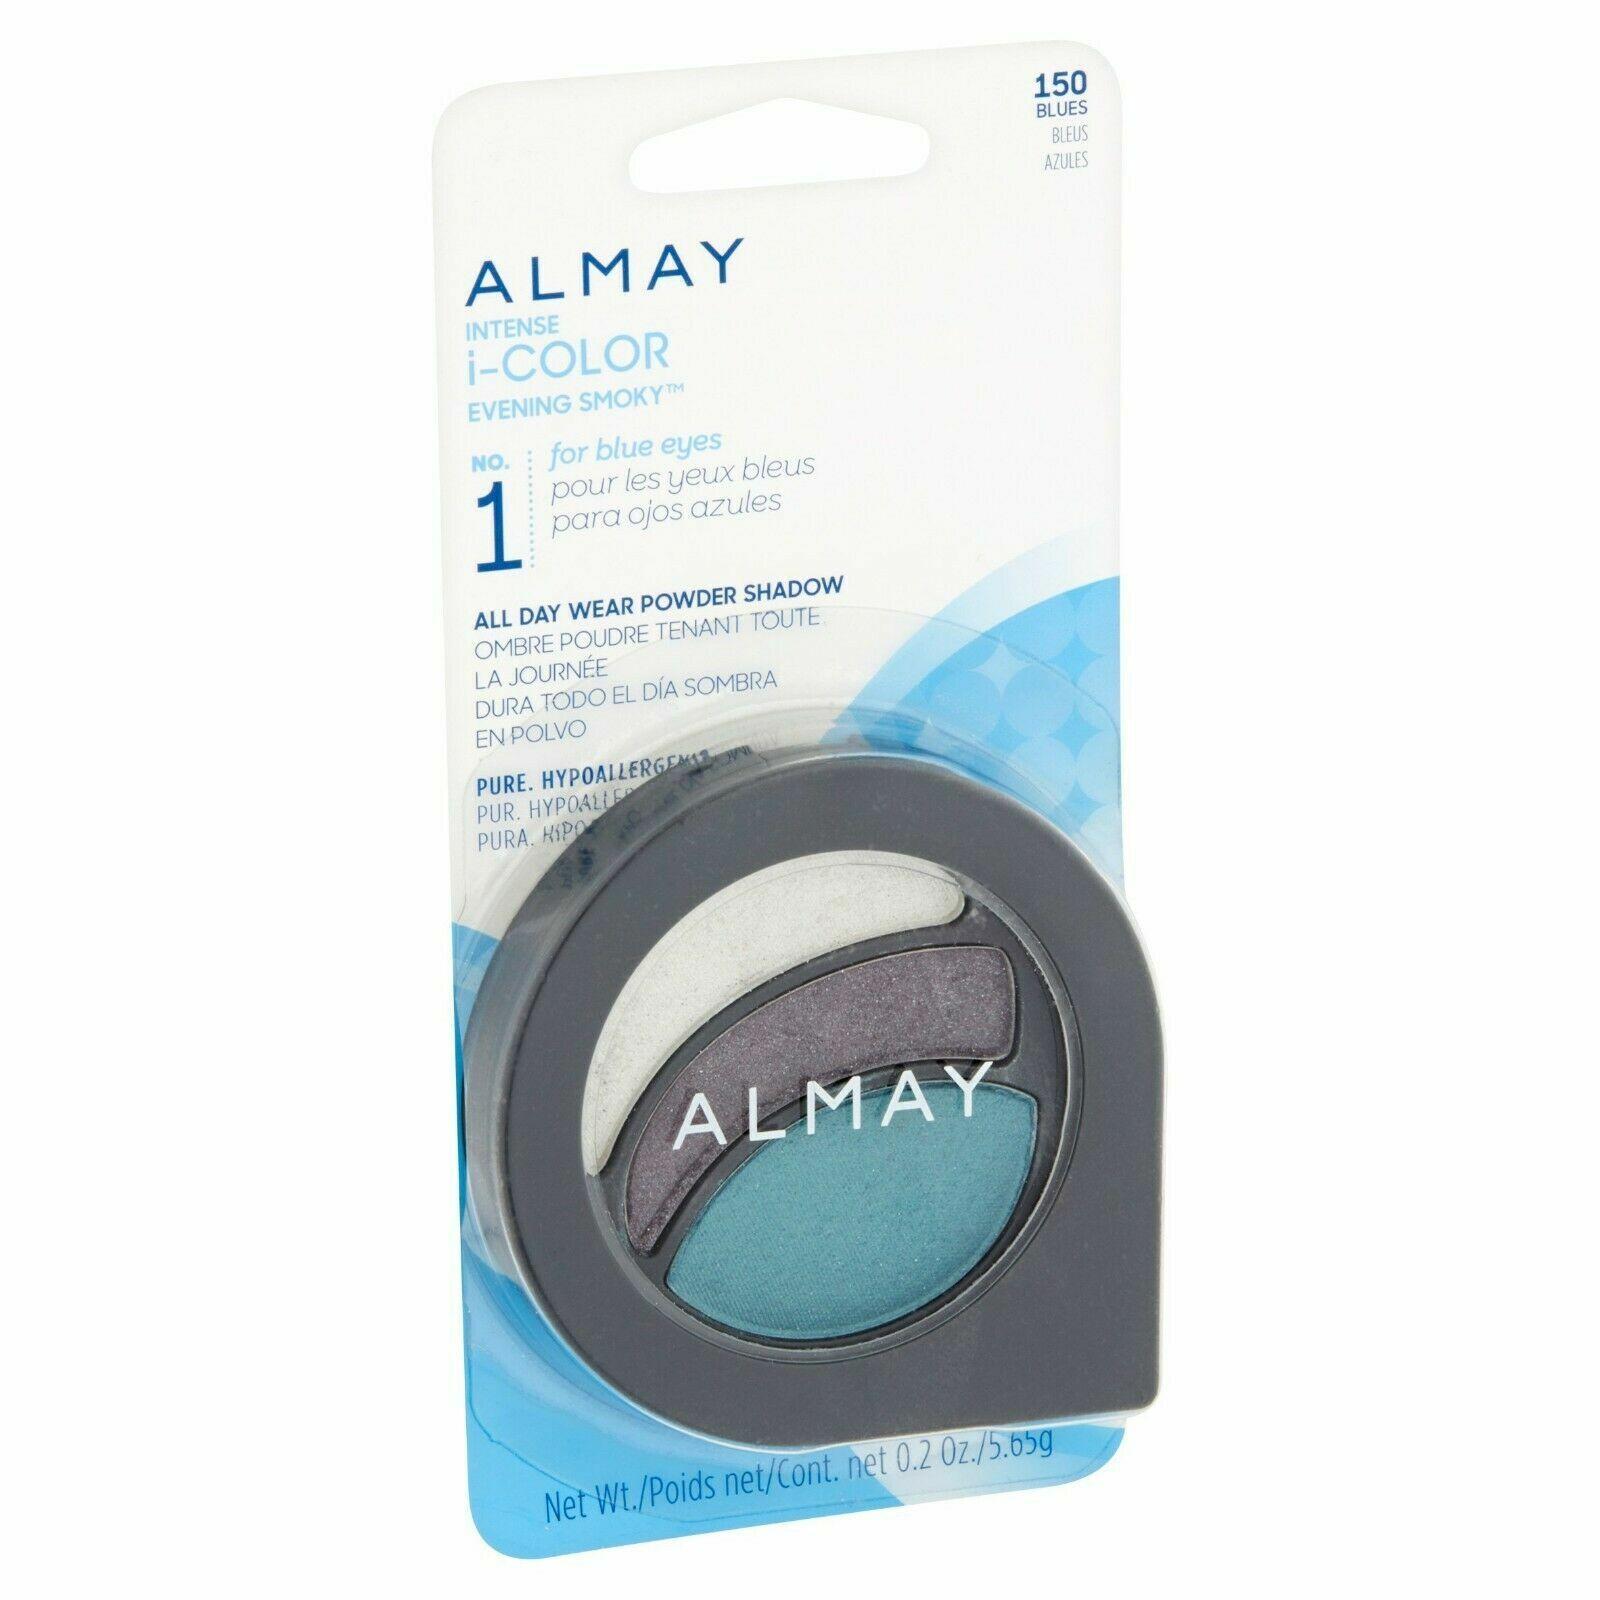 3 almay intense i-color evening smoky 150 blues powder shadow 1 liner